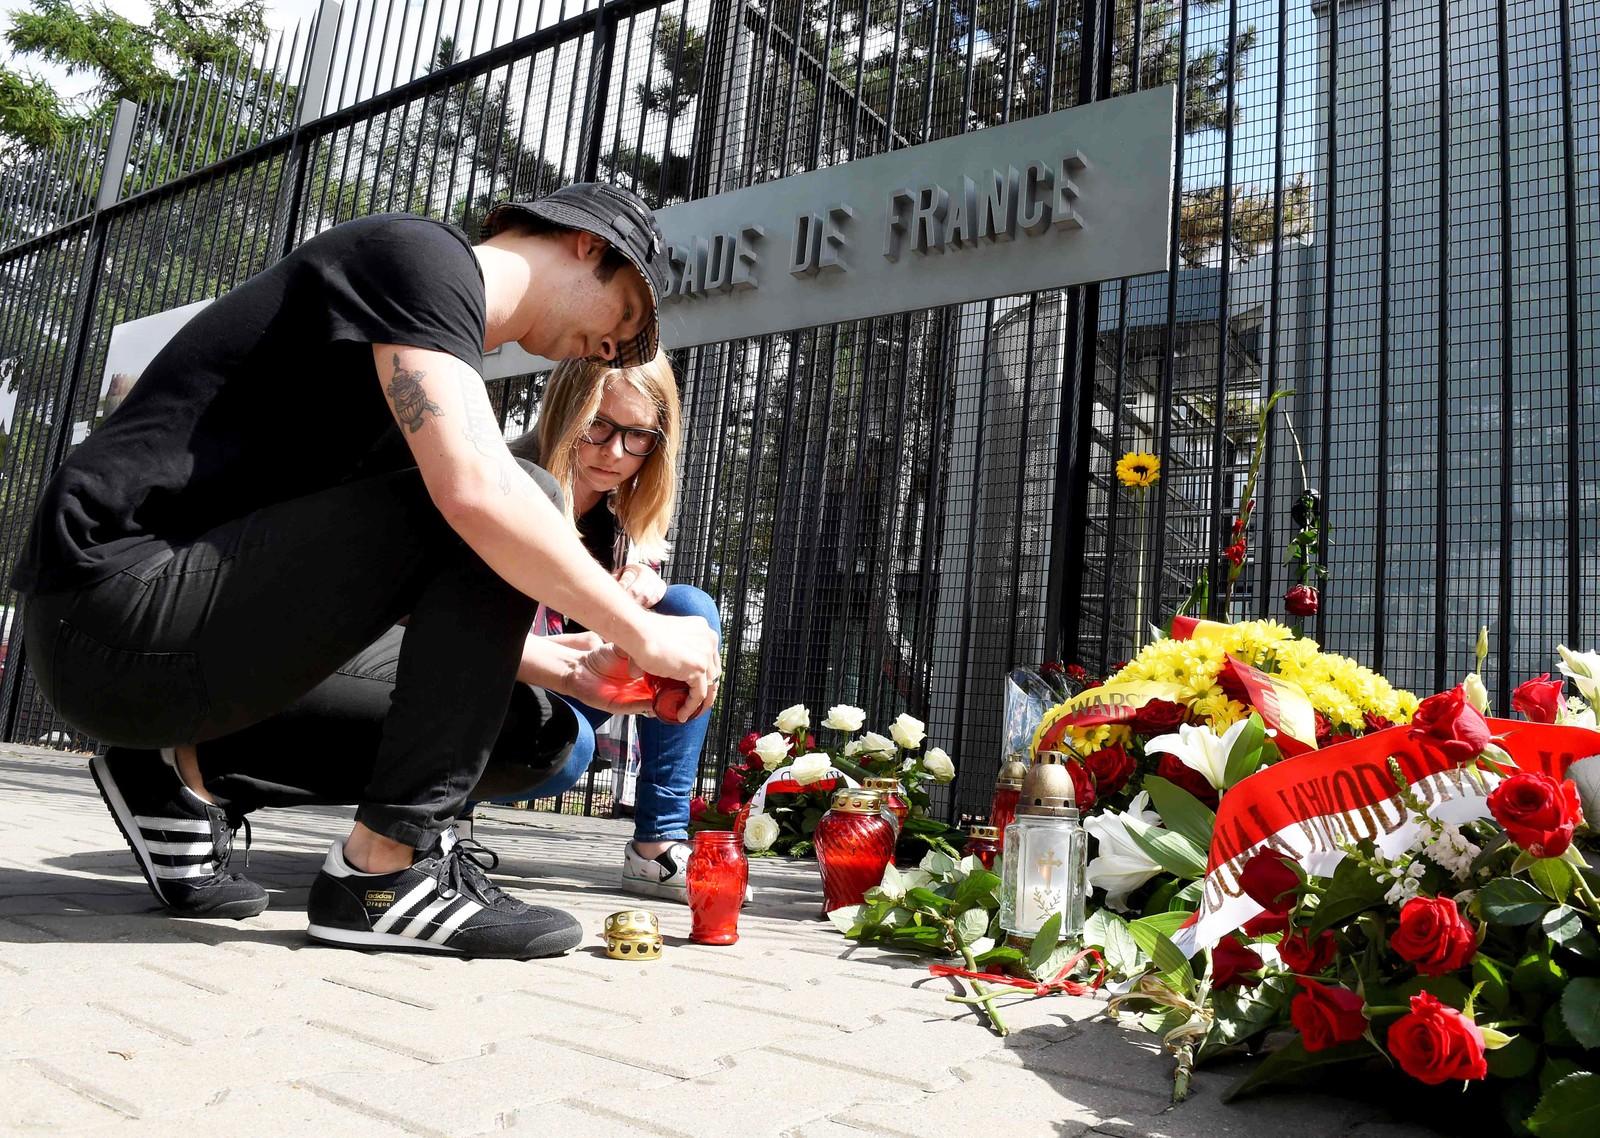 Blomster og lys foran den franske ambassaden i Warszawa i Polen, til minne om ofrene for terrorangrepet i Nice 14. juli.